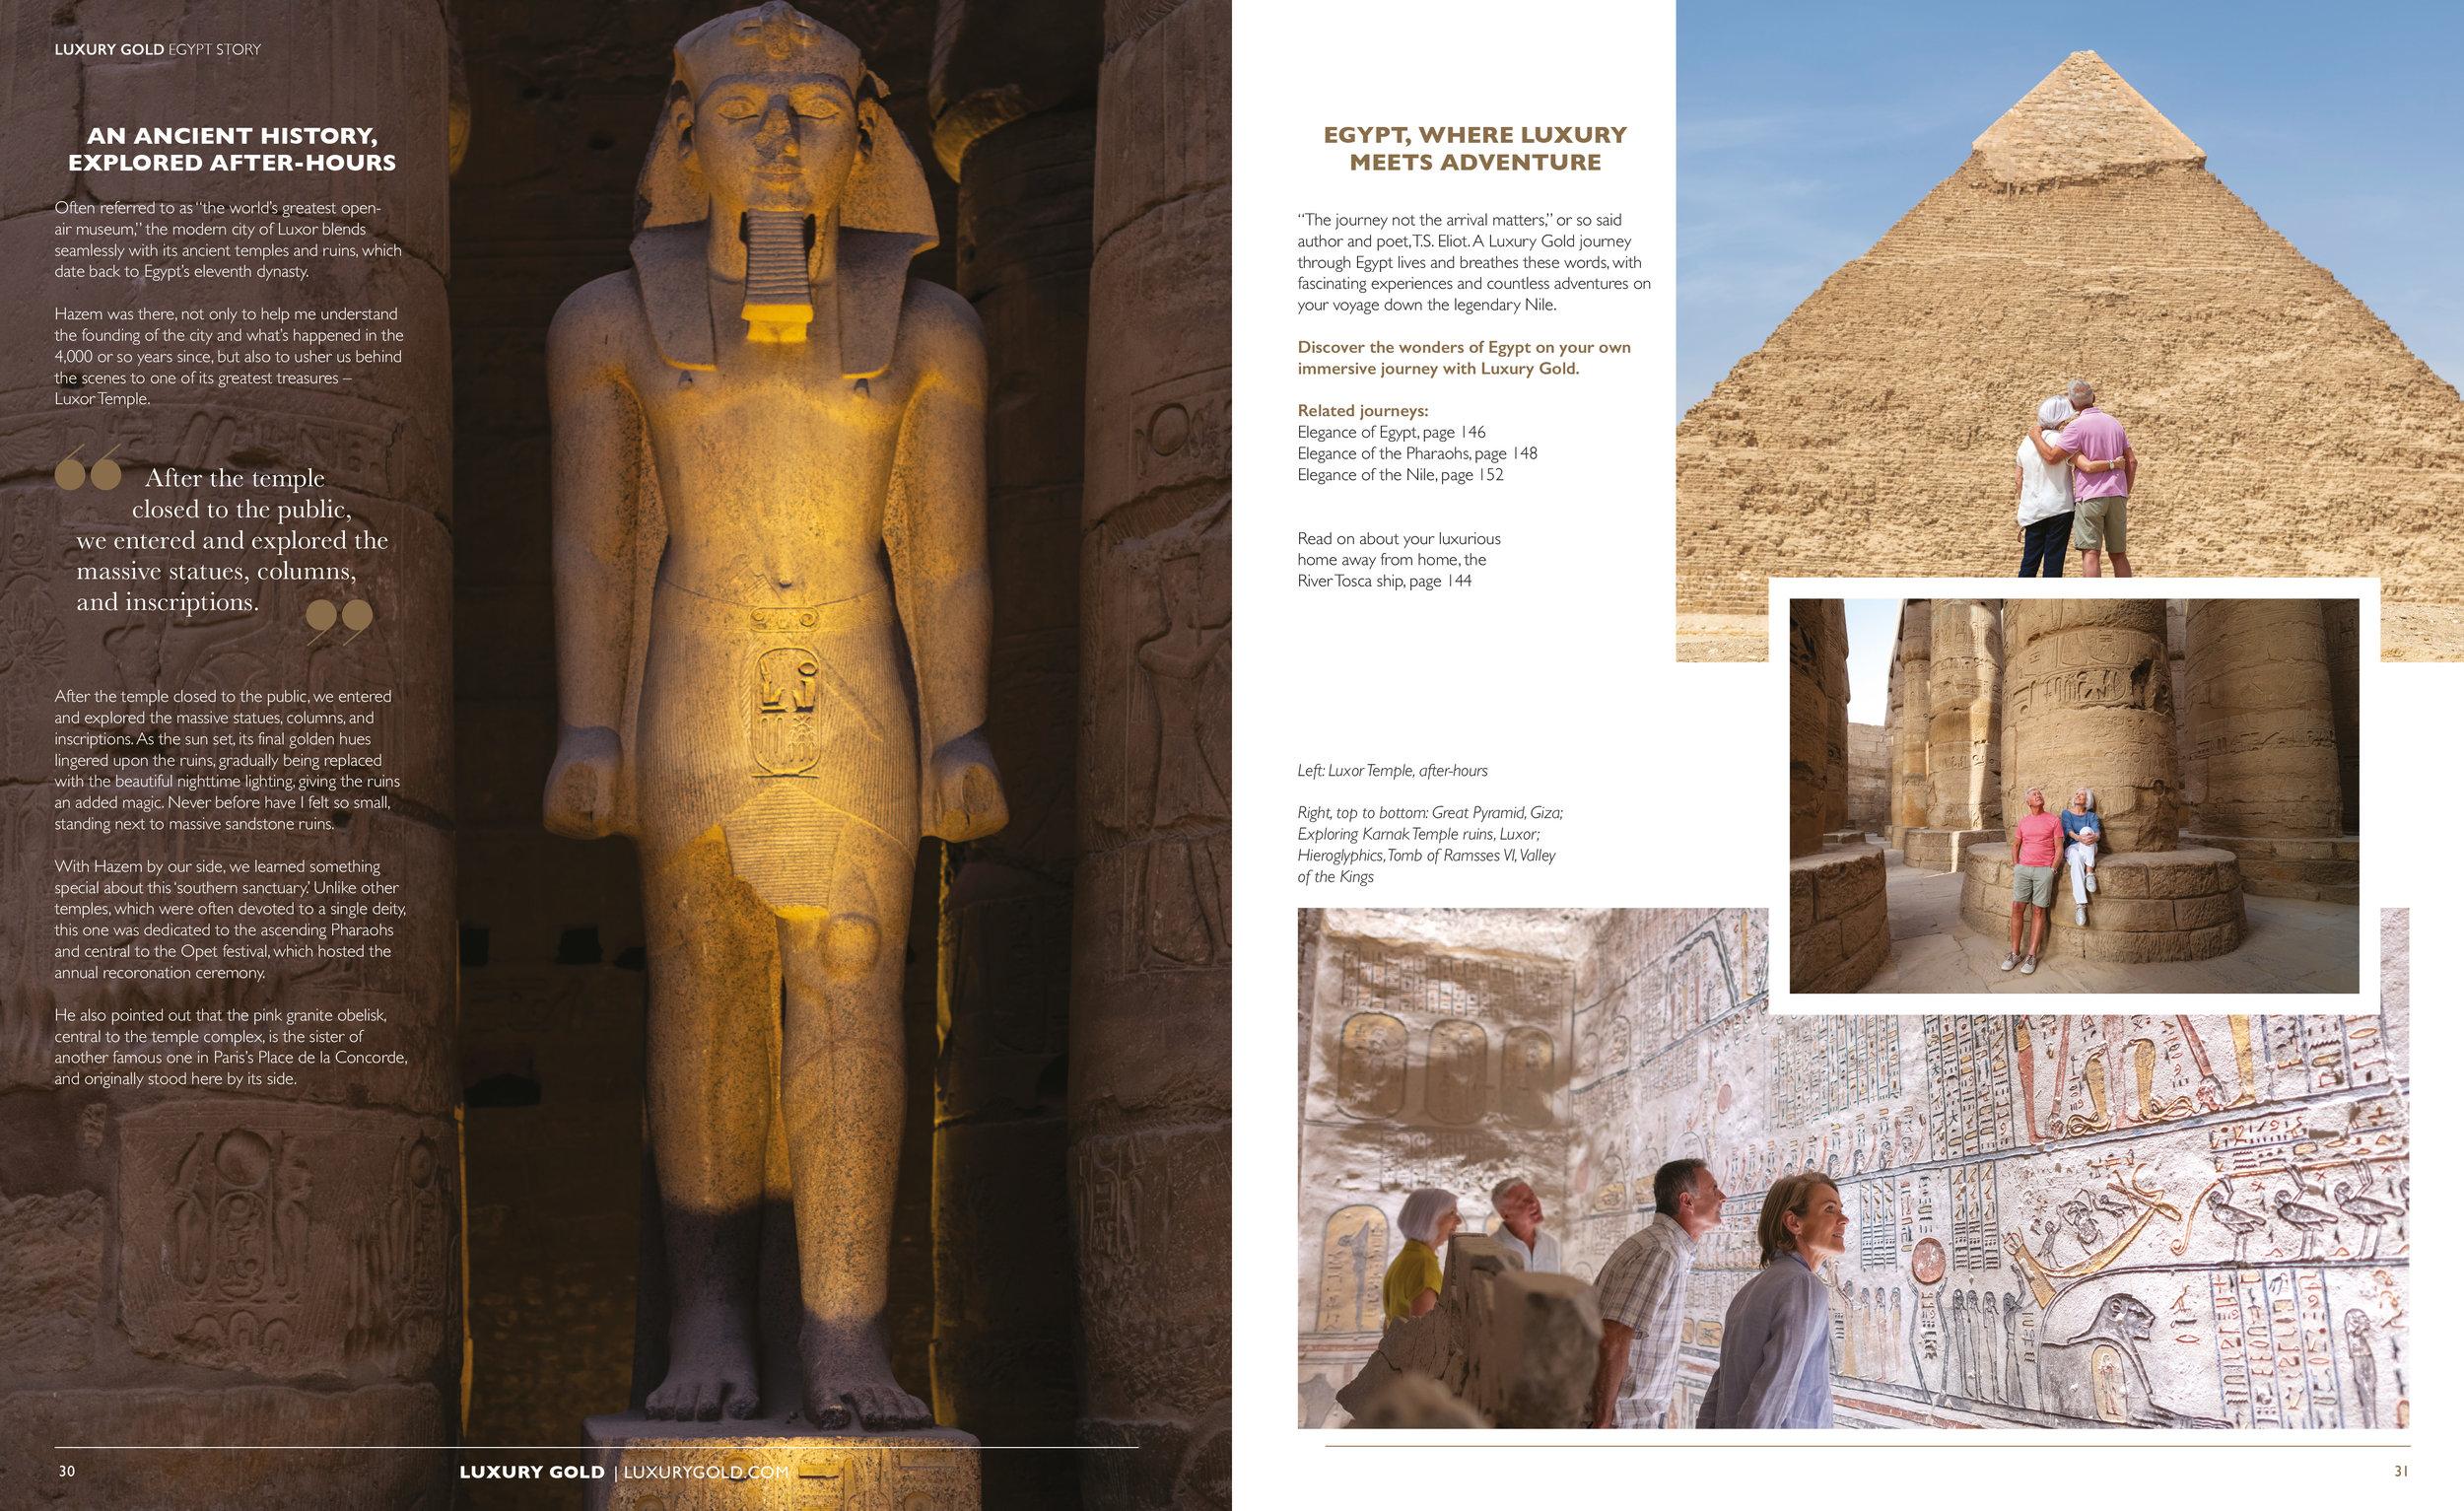 LG-Brochure-2020-p30-31.jpg